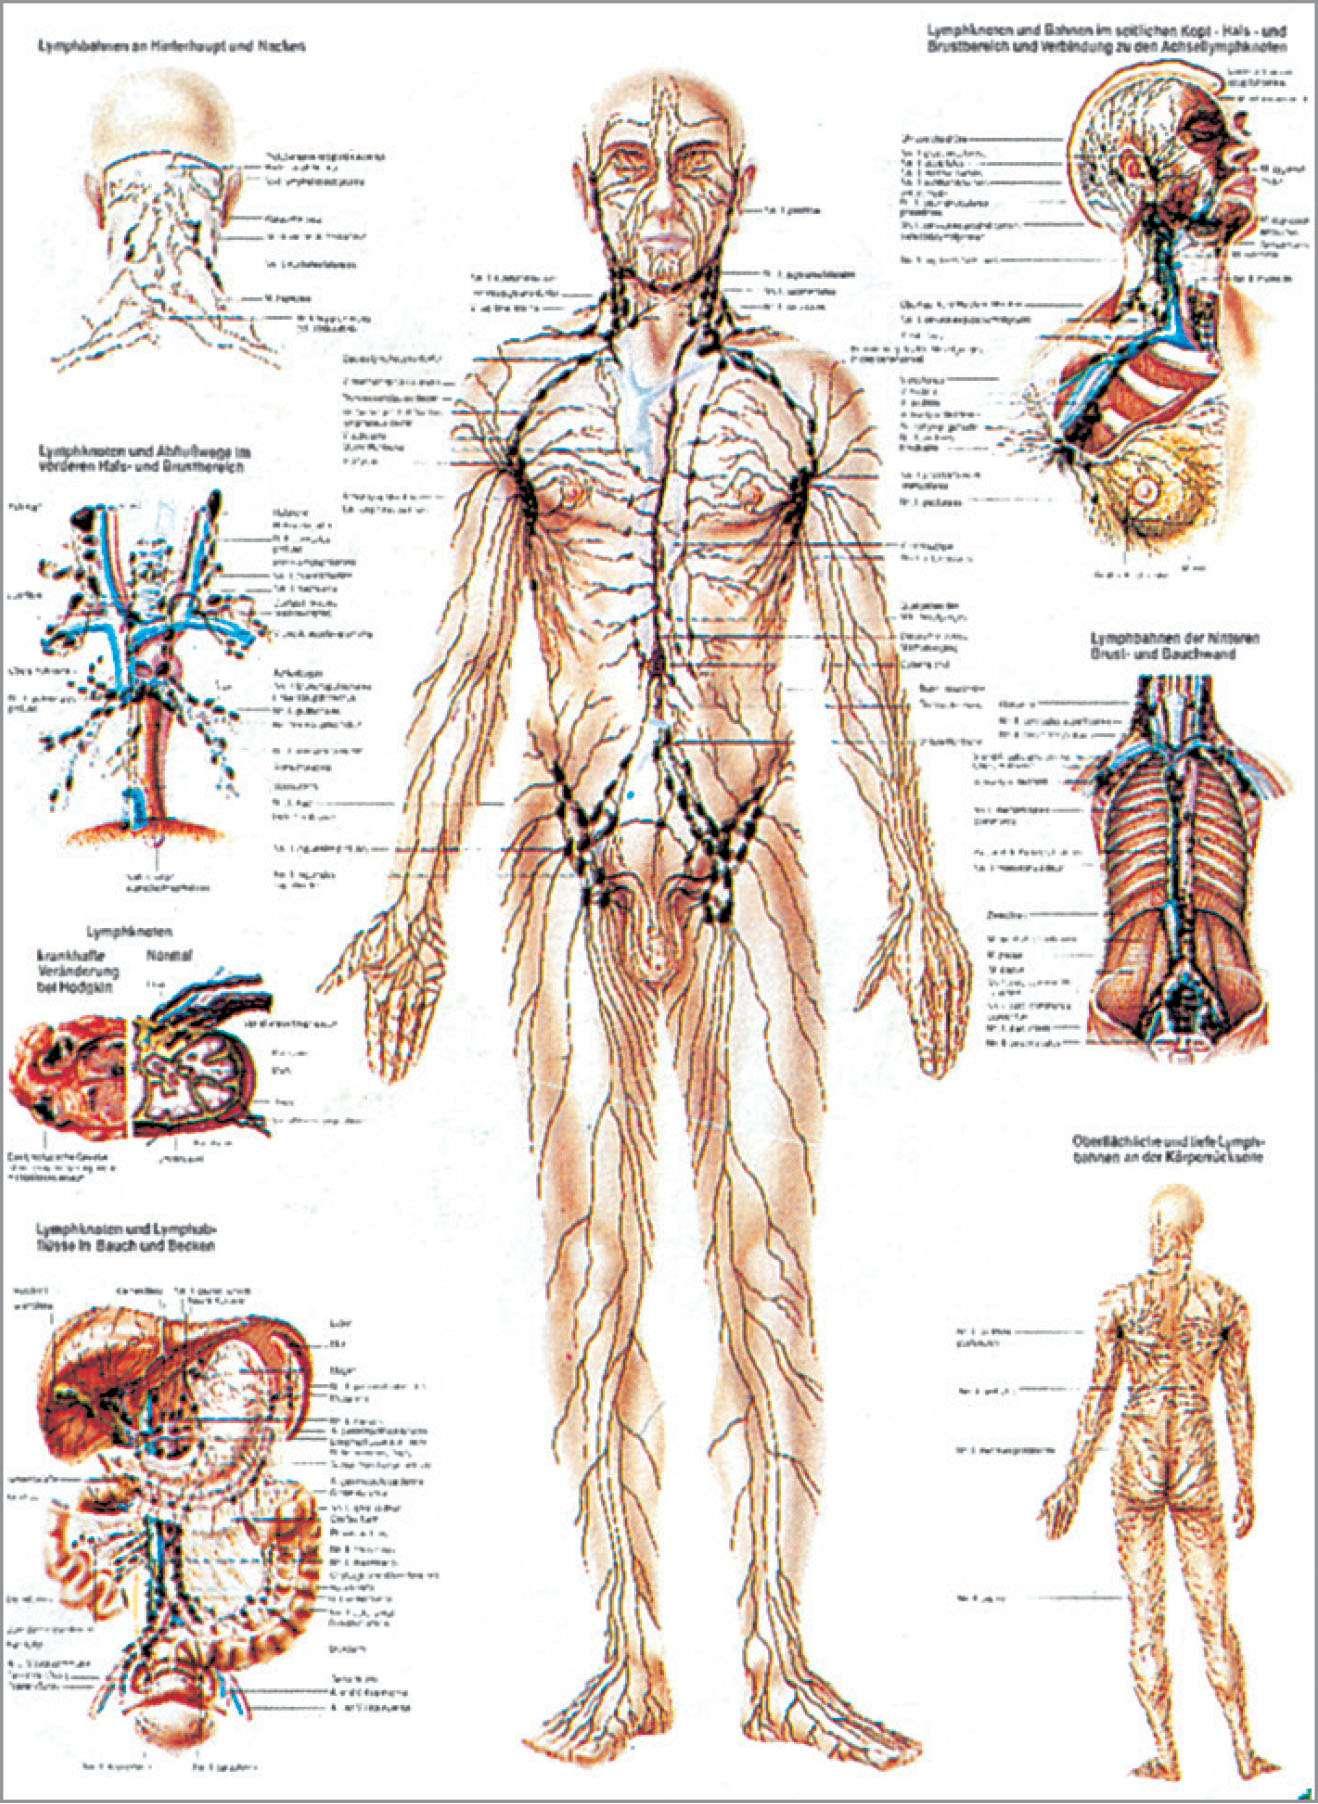 Tolle Kapitel 10 Muskelsystem Makroskopische Anatomie Fotos ...